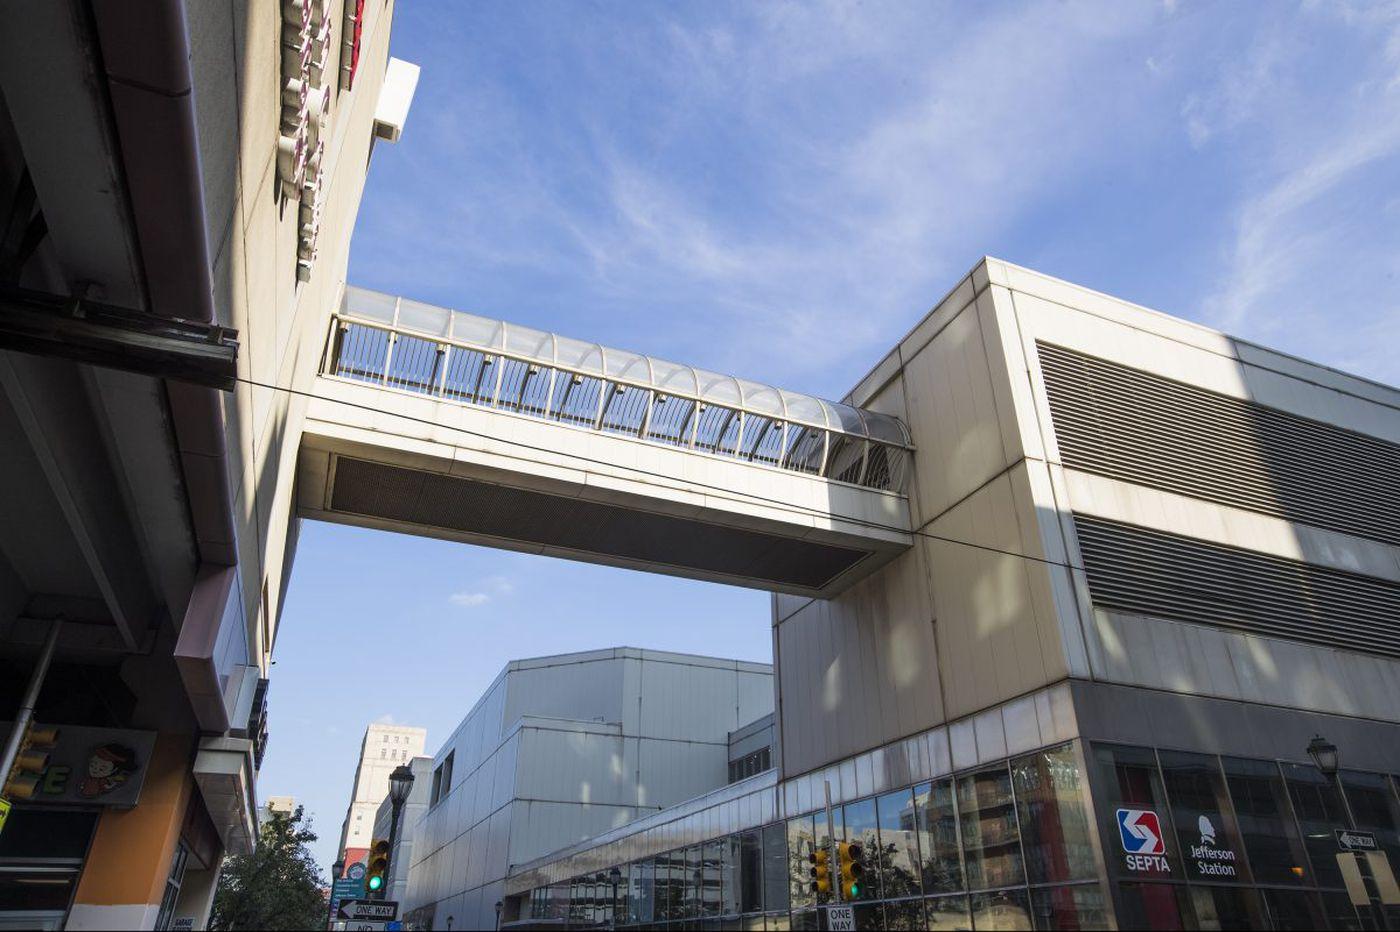 Curtain is raised on movie multiplex plans at reborn Gallery mall